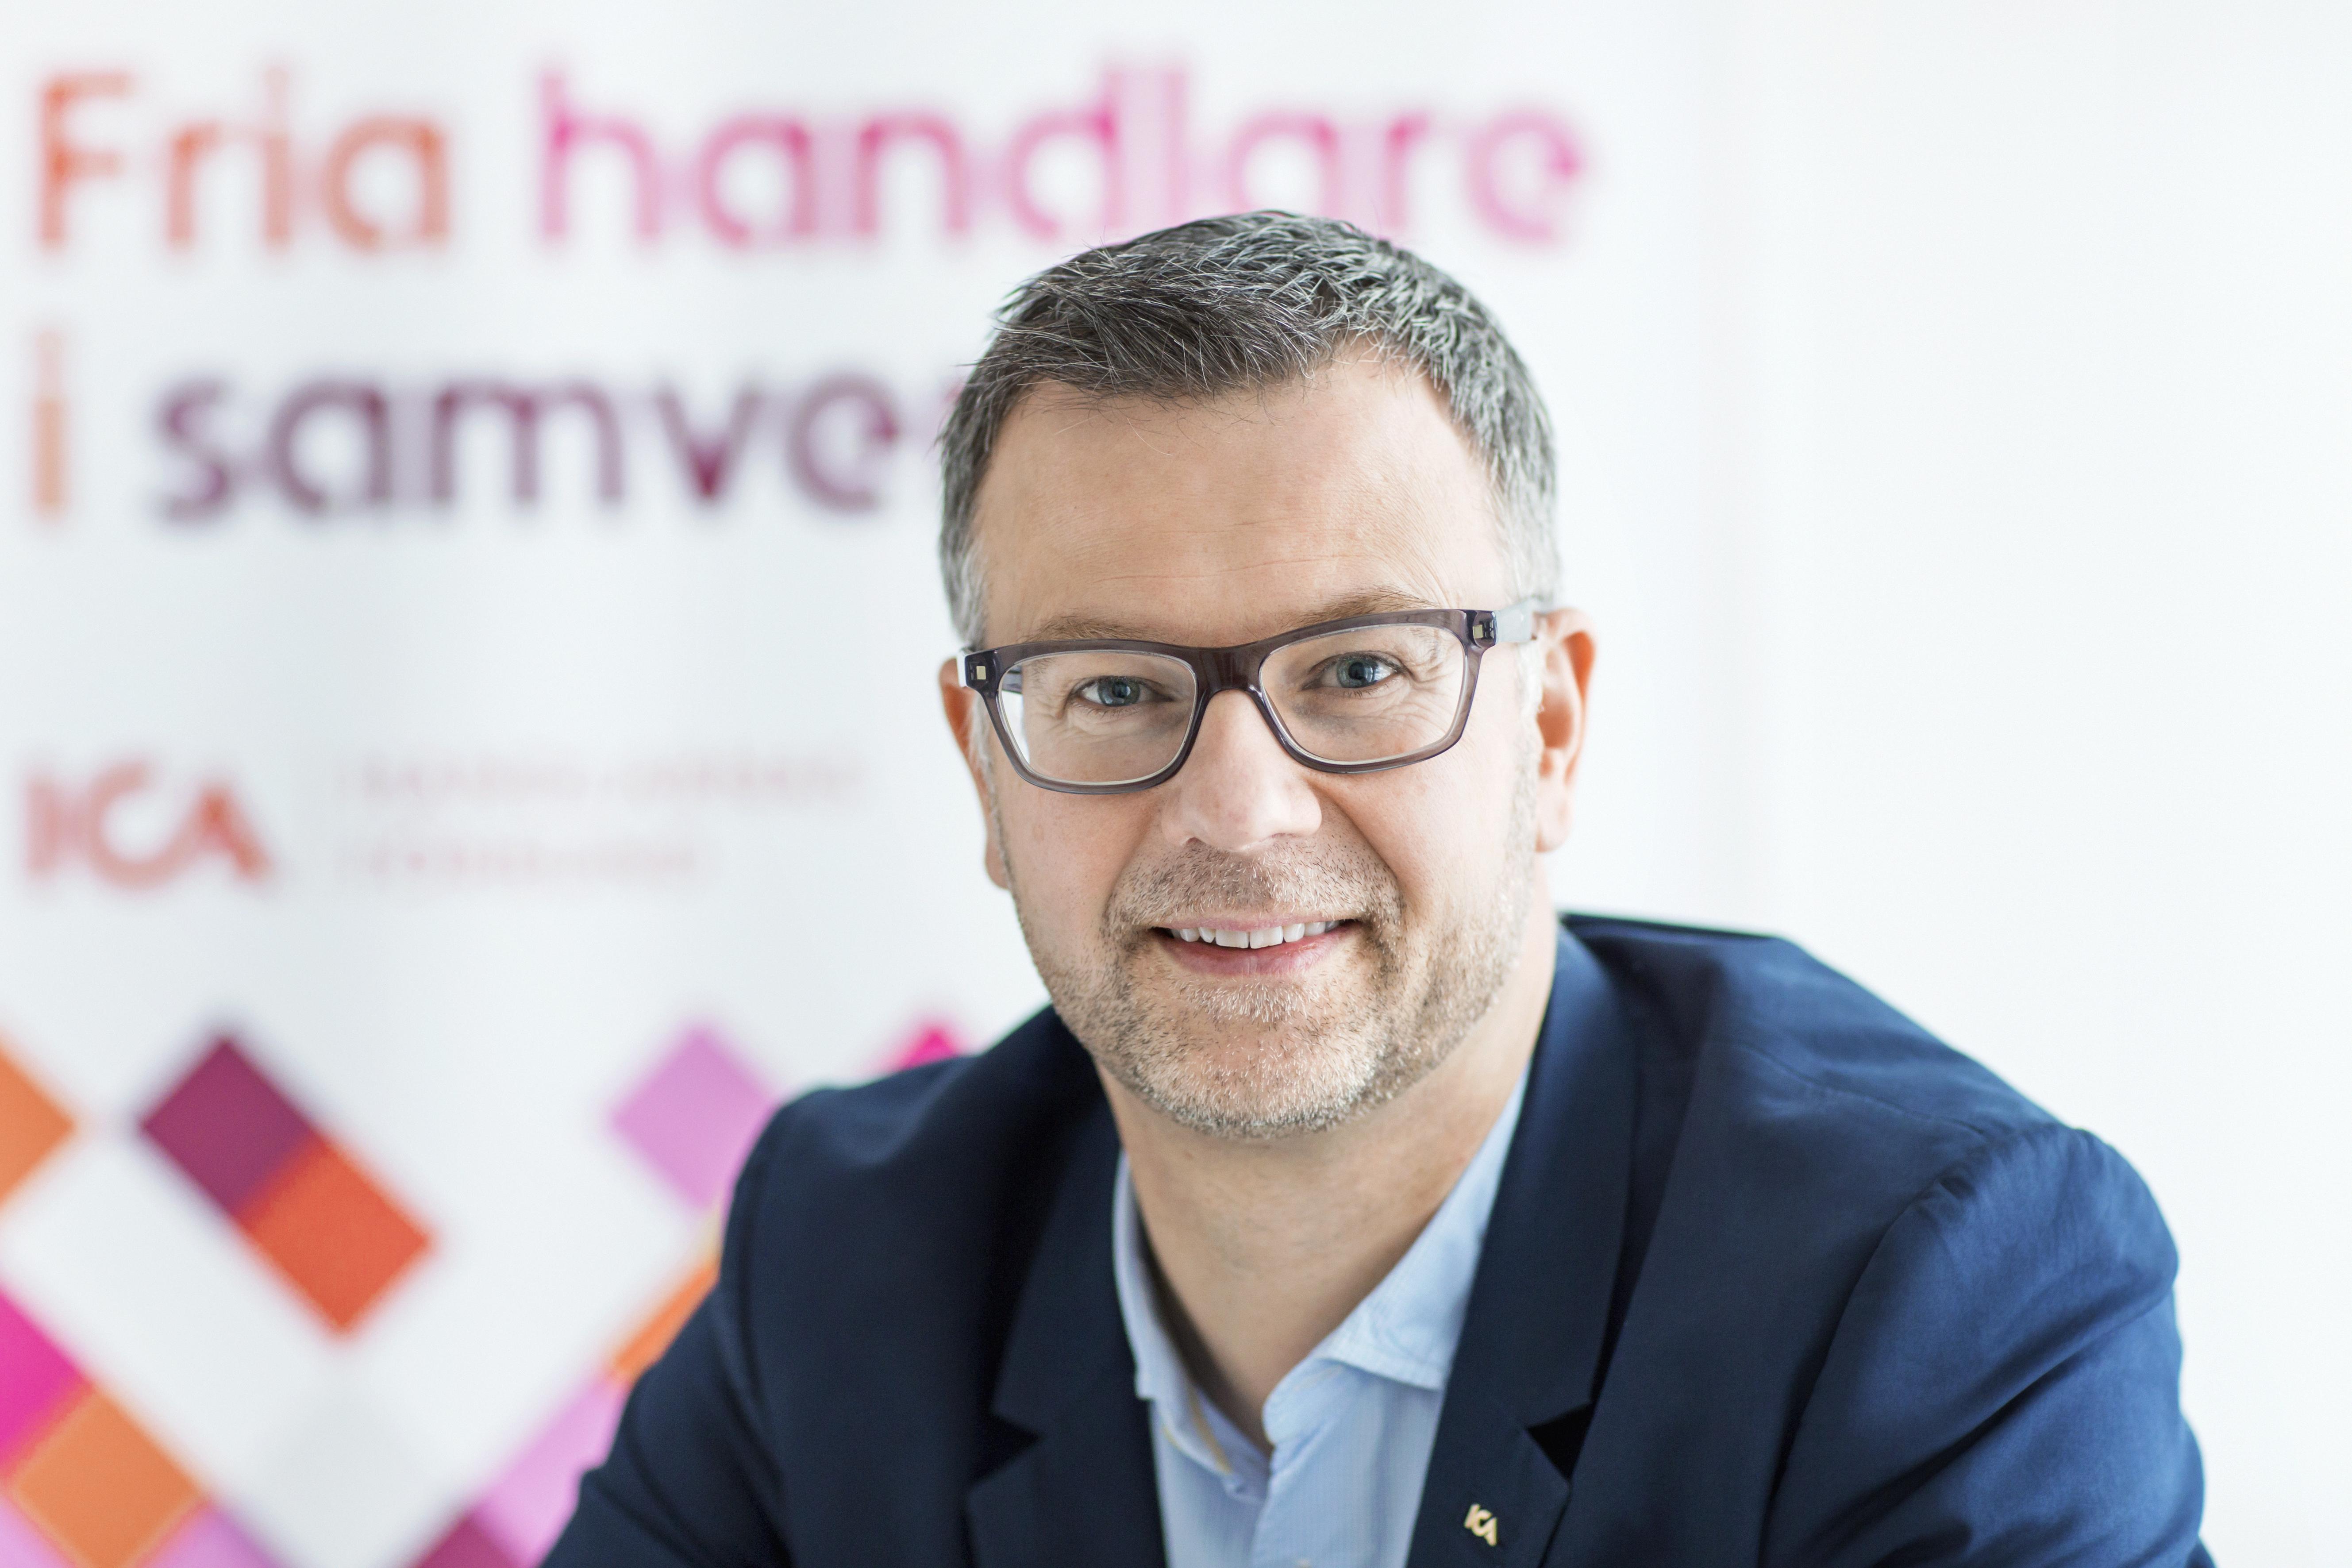 Fredrik Hägglund till Svensk Handels styrelse